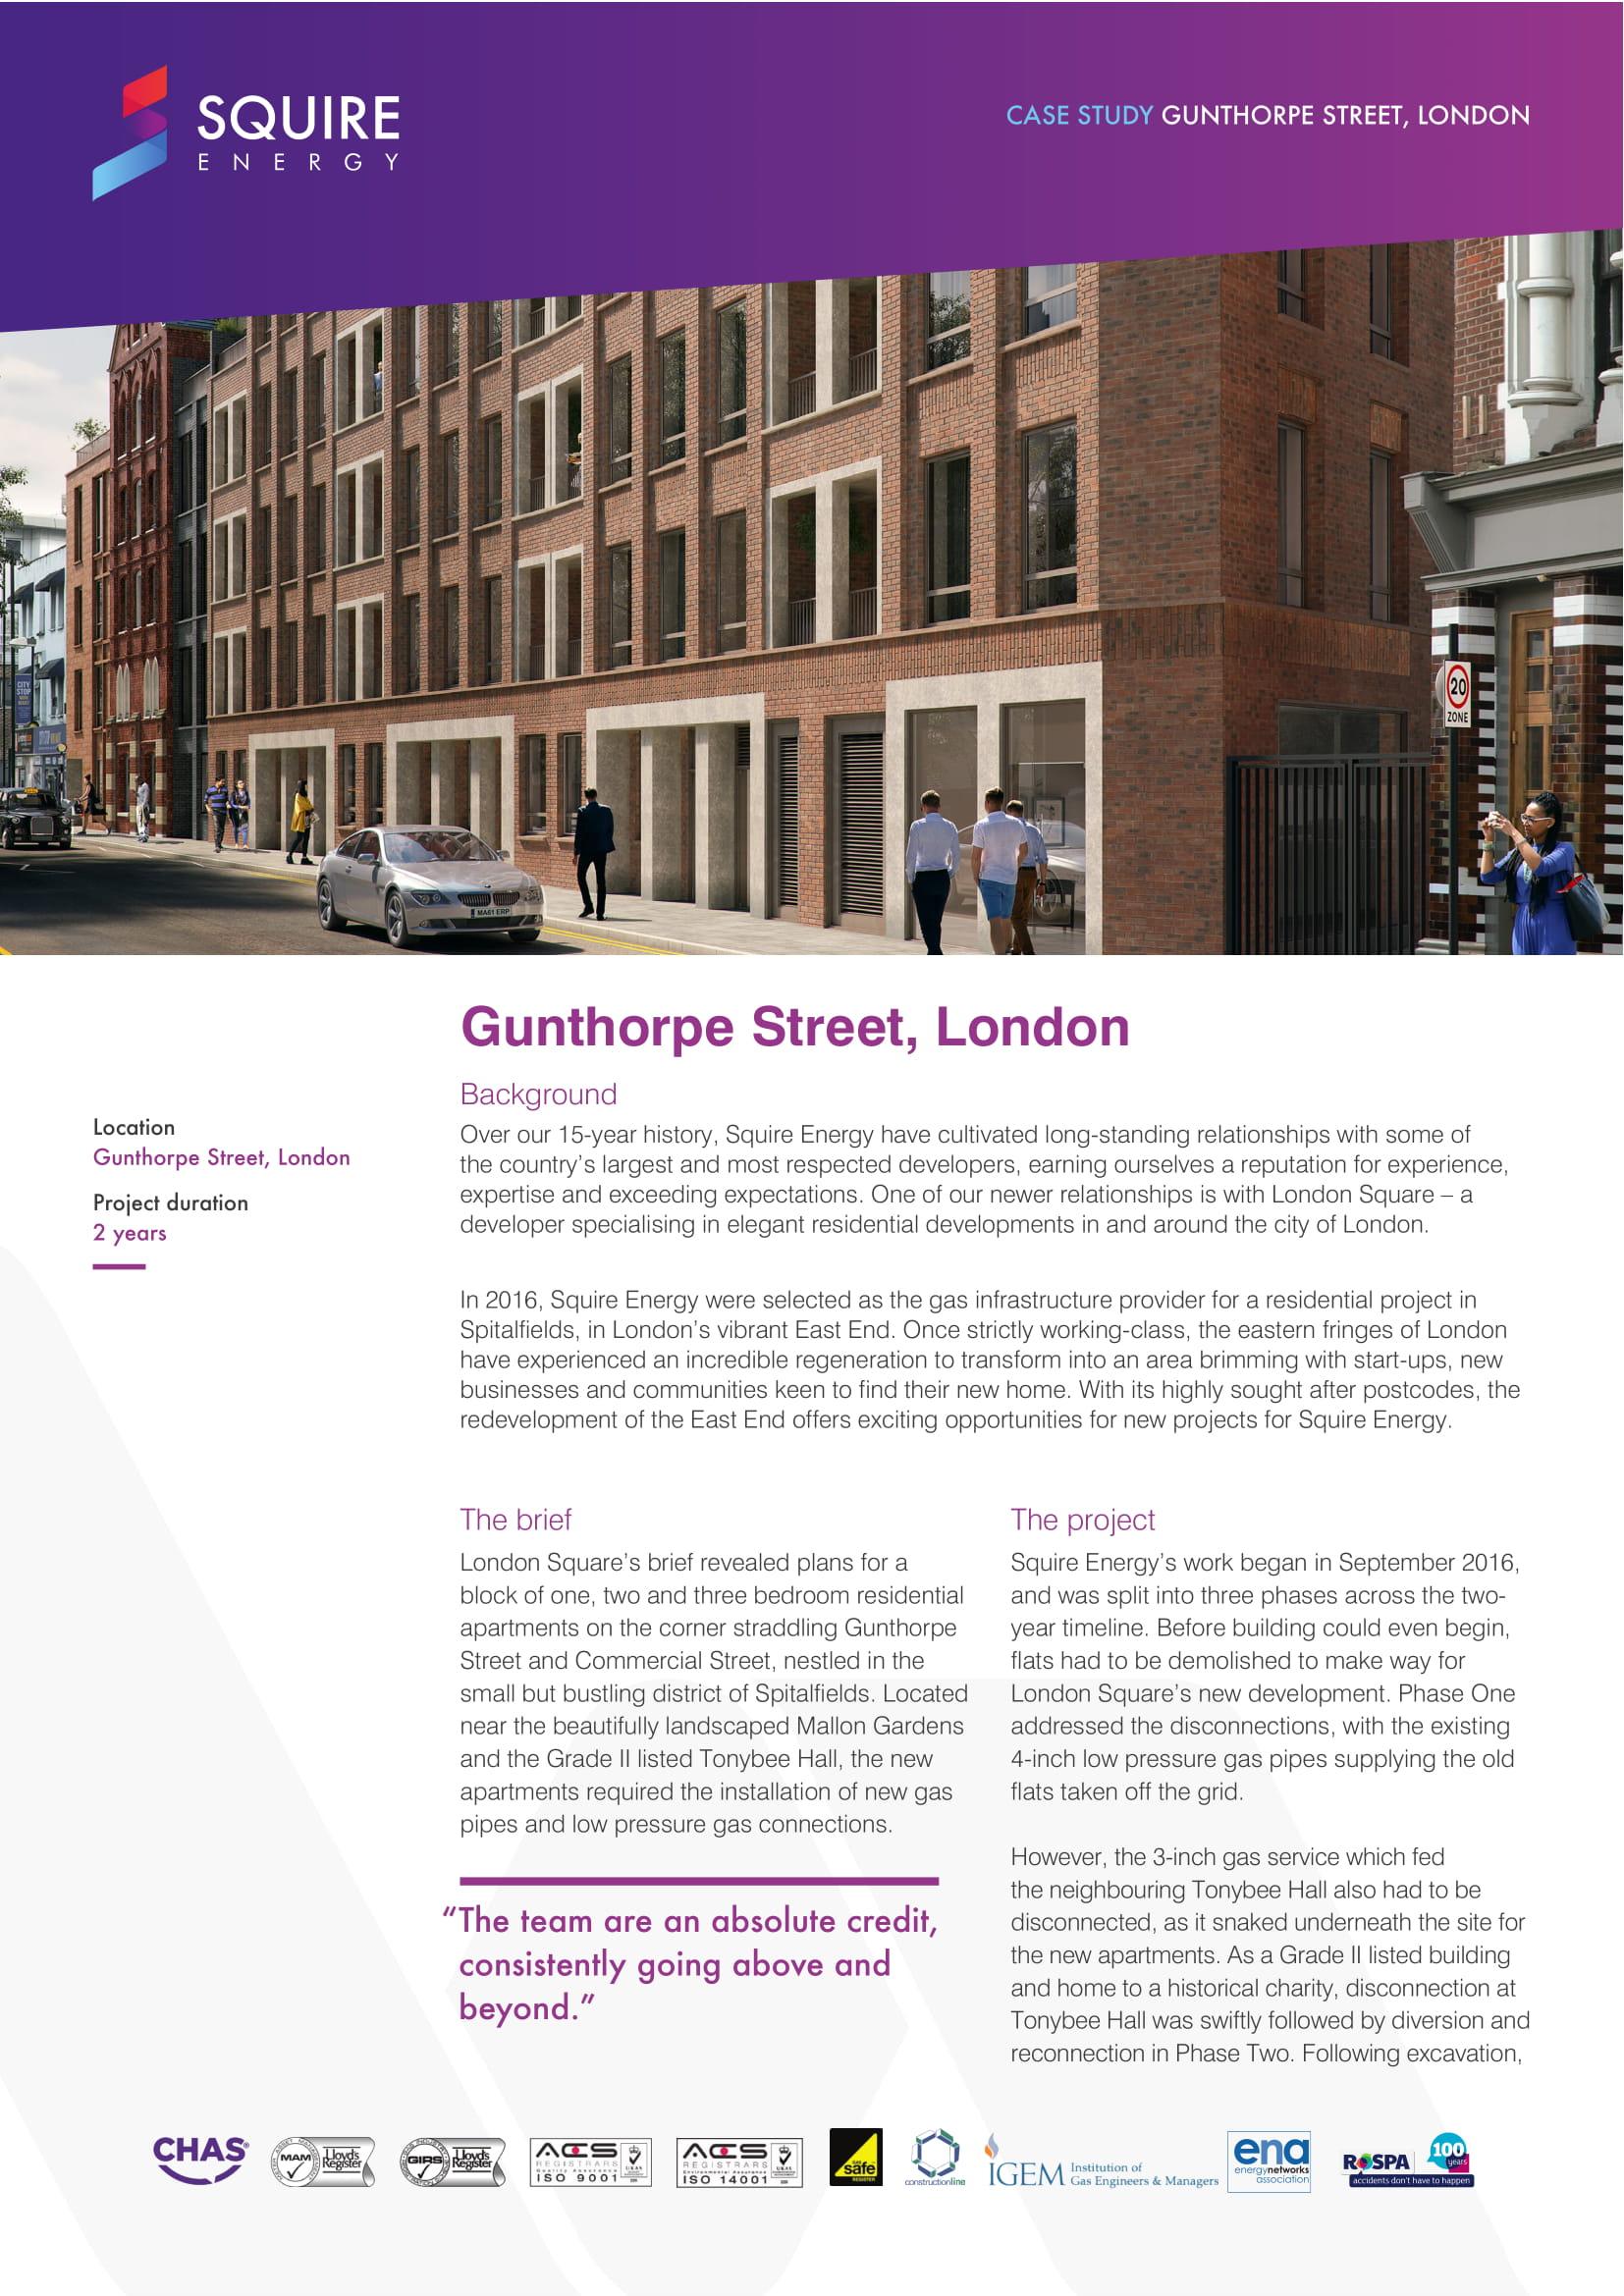 Gunthorpe Street, London square, spitalfields page 1